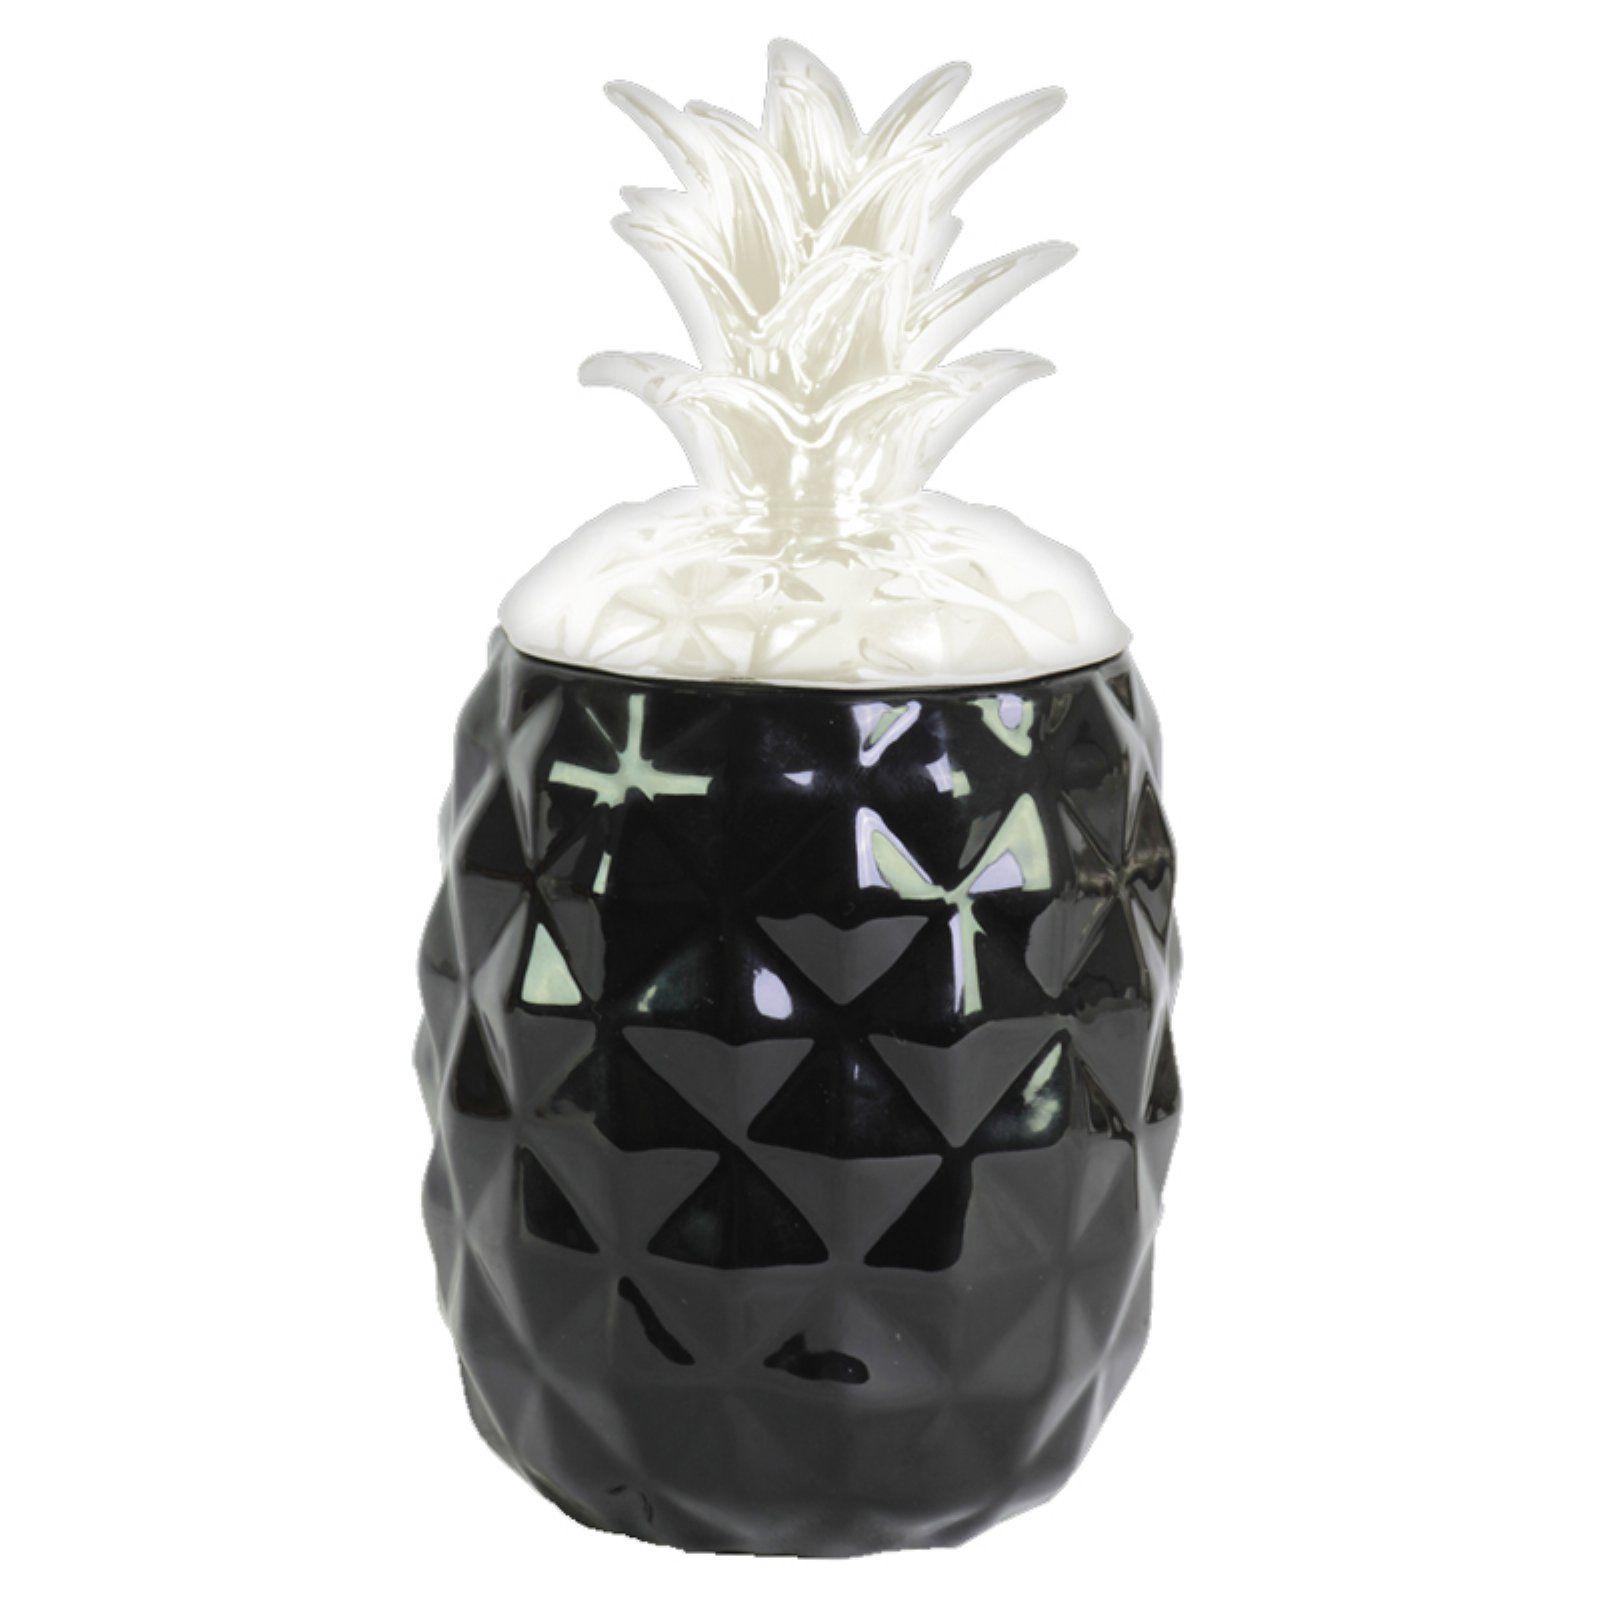 Urban Trends Ceramic Pineapple Canister Black White Lid